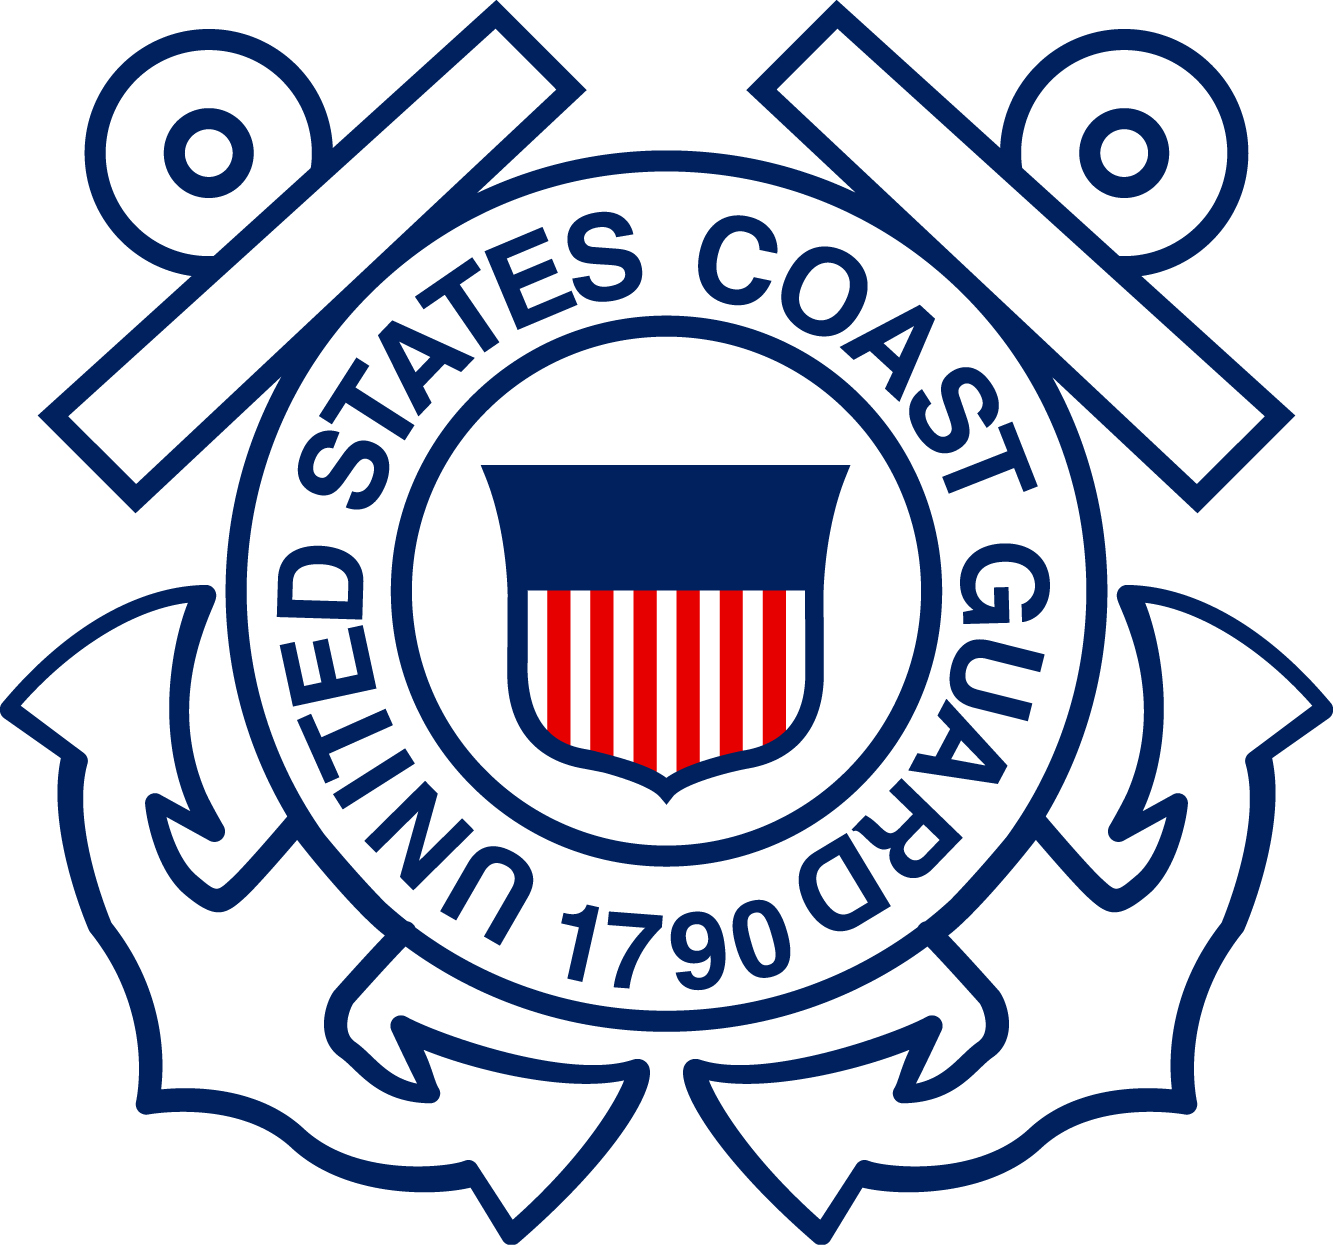 Coast Guard Logo Clipart #1-Coast Guard Logo Clipart #1-1